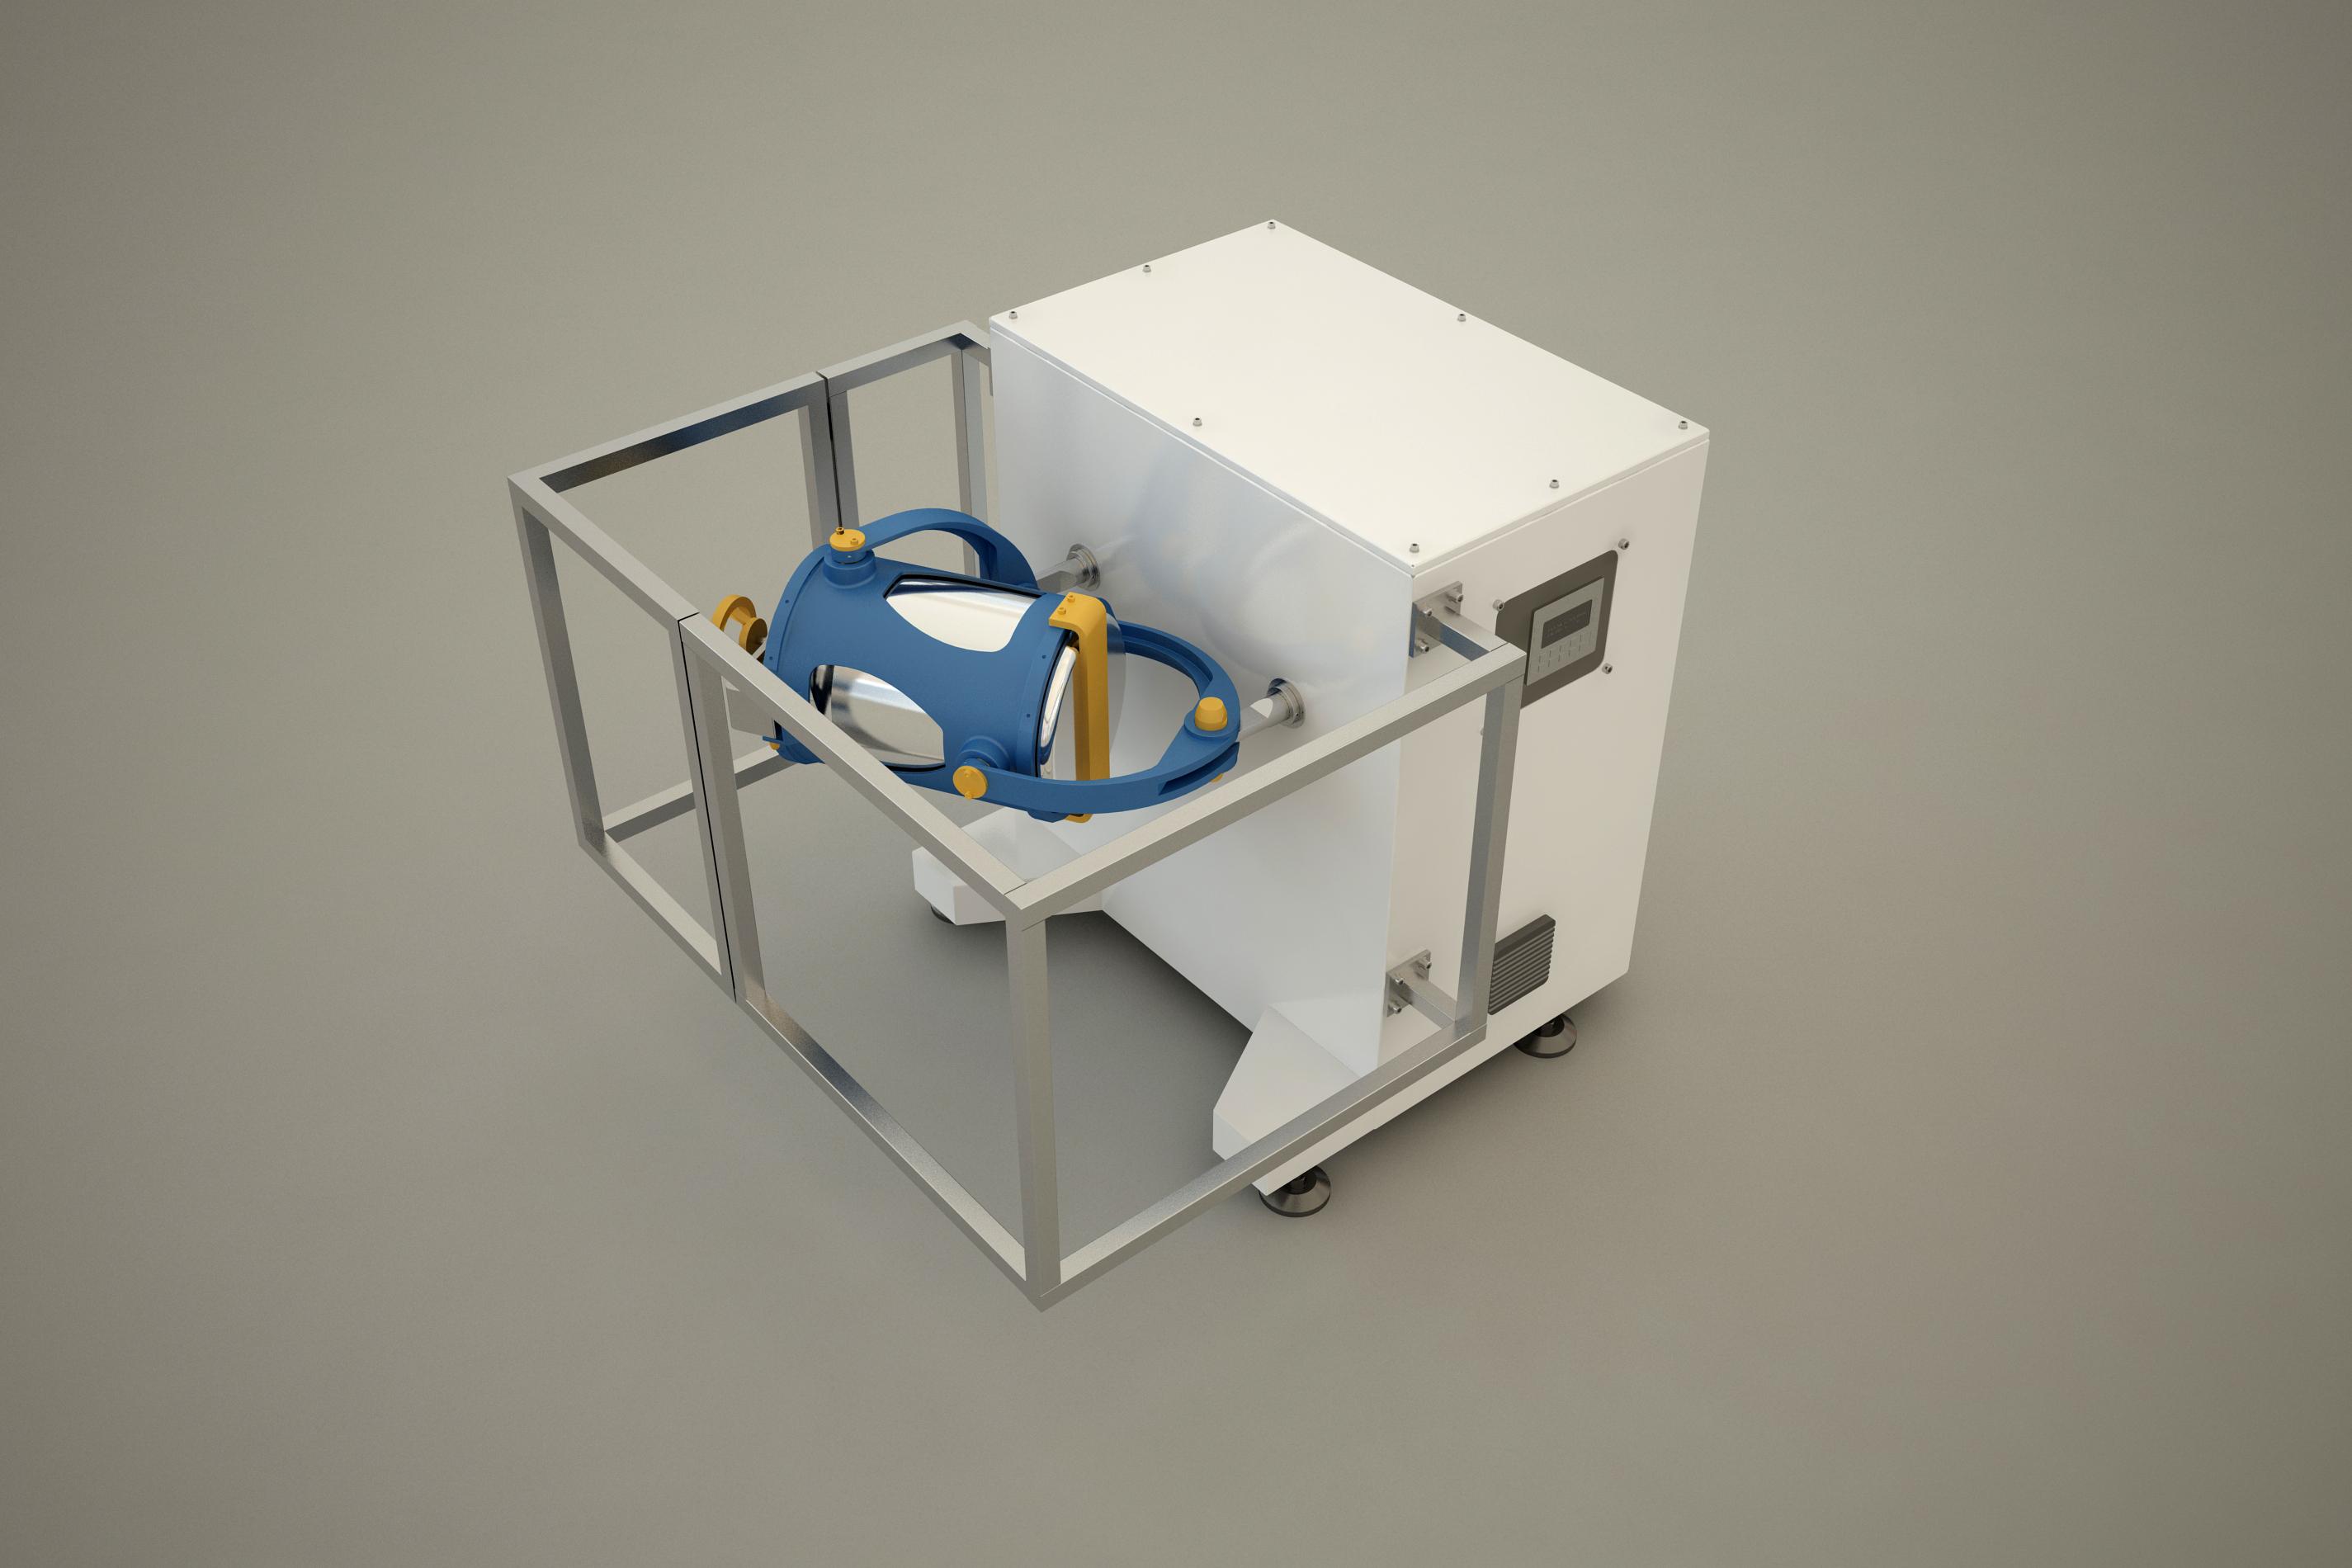 3D Tumbler Mixer For Food Ingredients